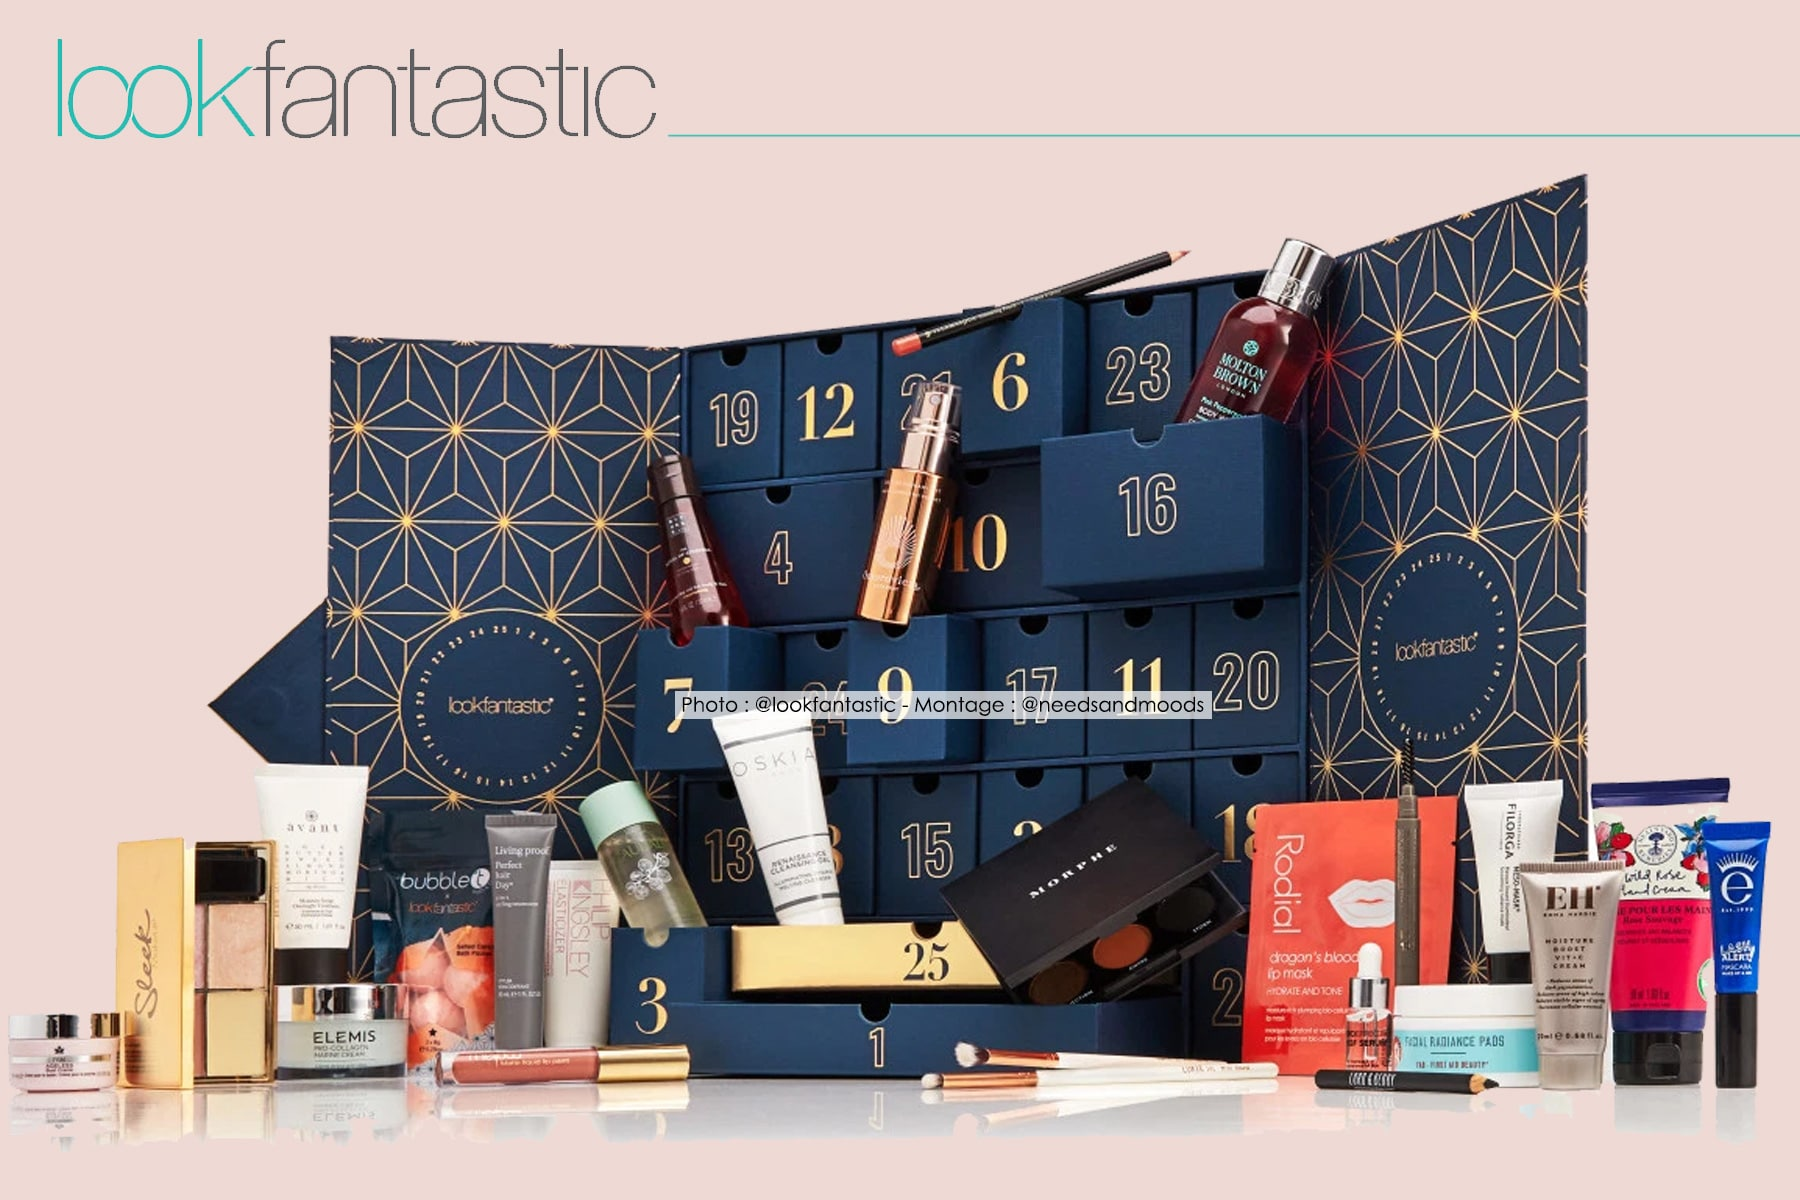 calendrier-avent-lookfantastic-2019-unboxing